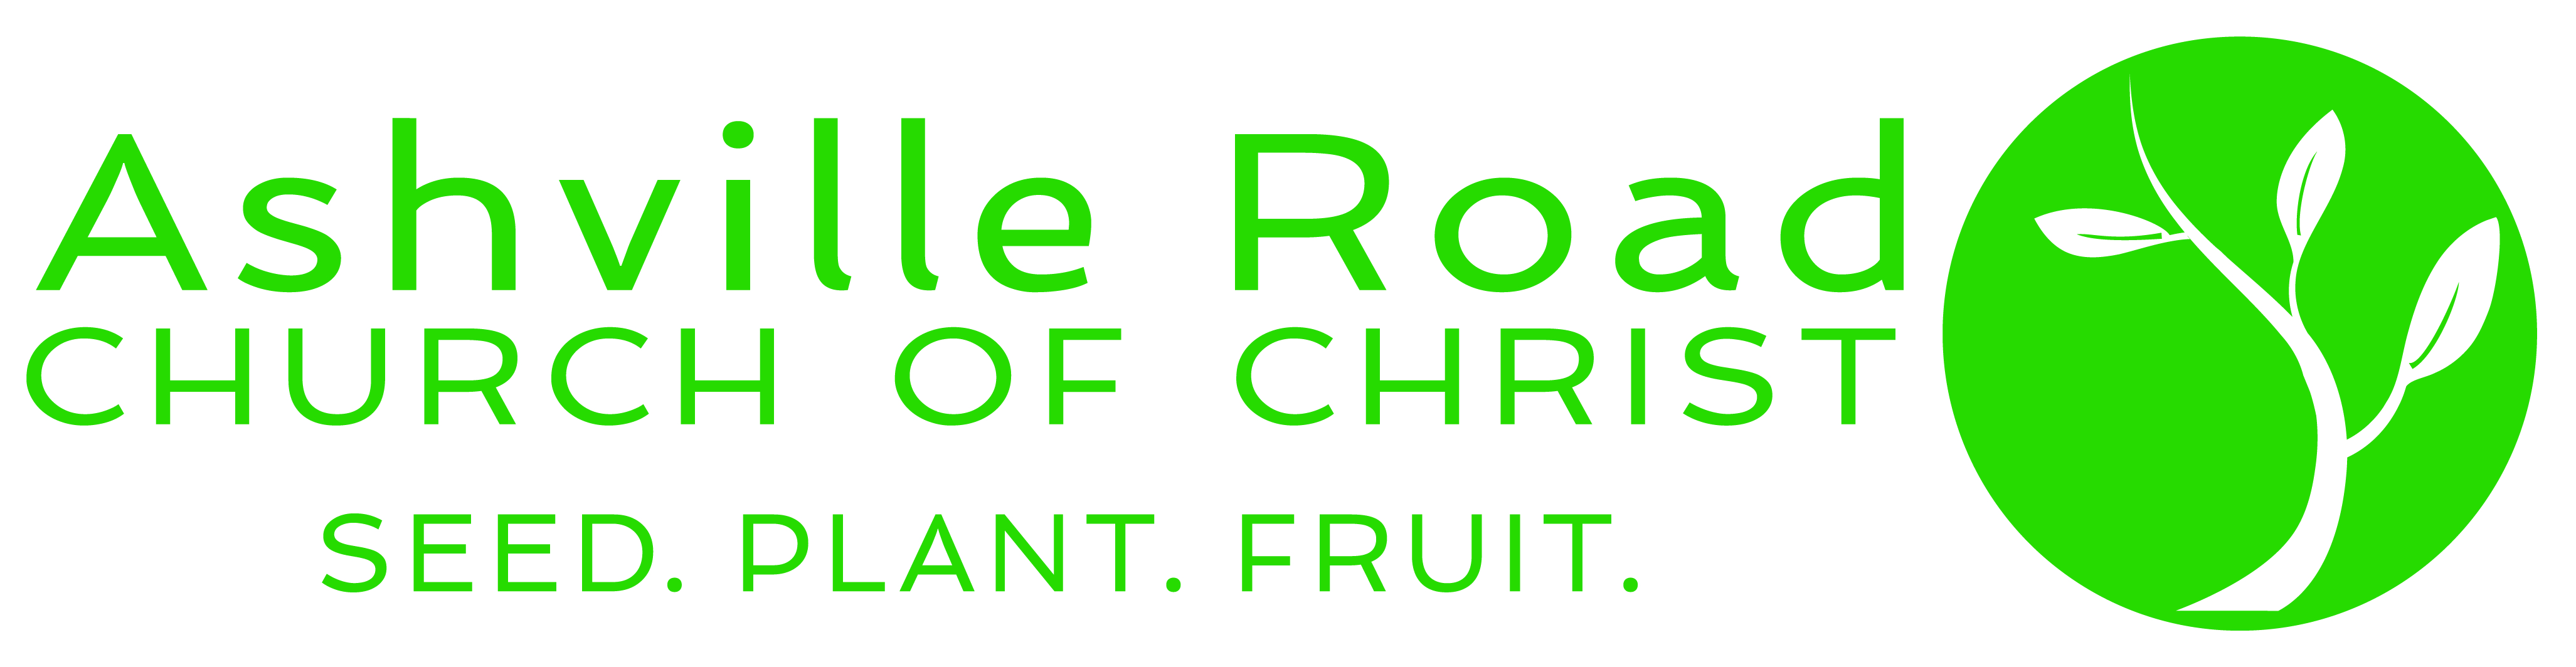 Ashville Road Church of Christ